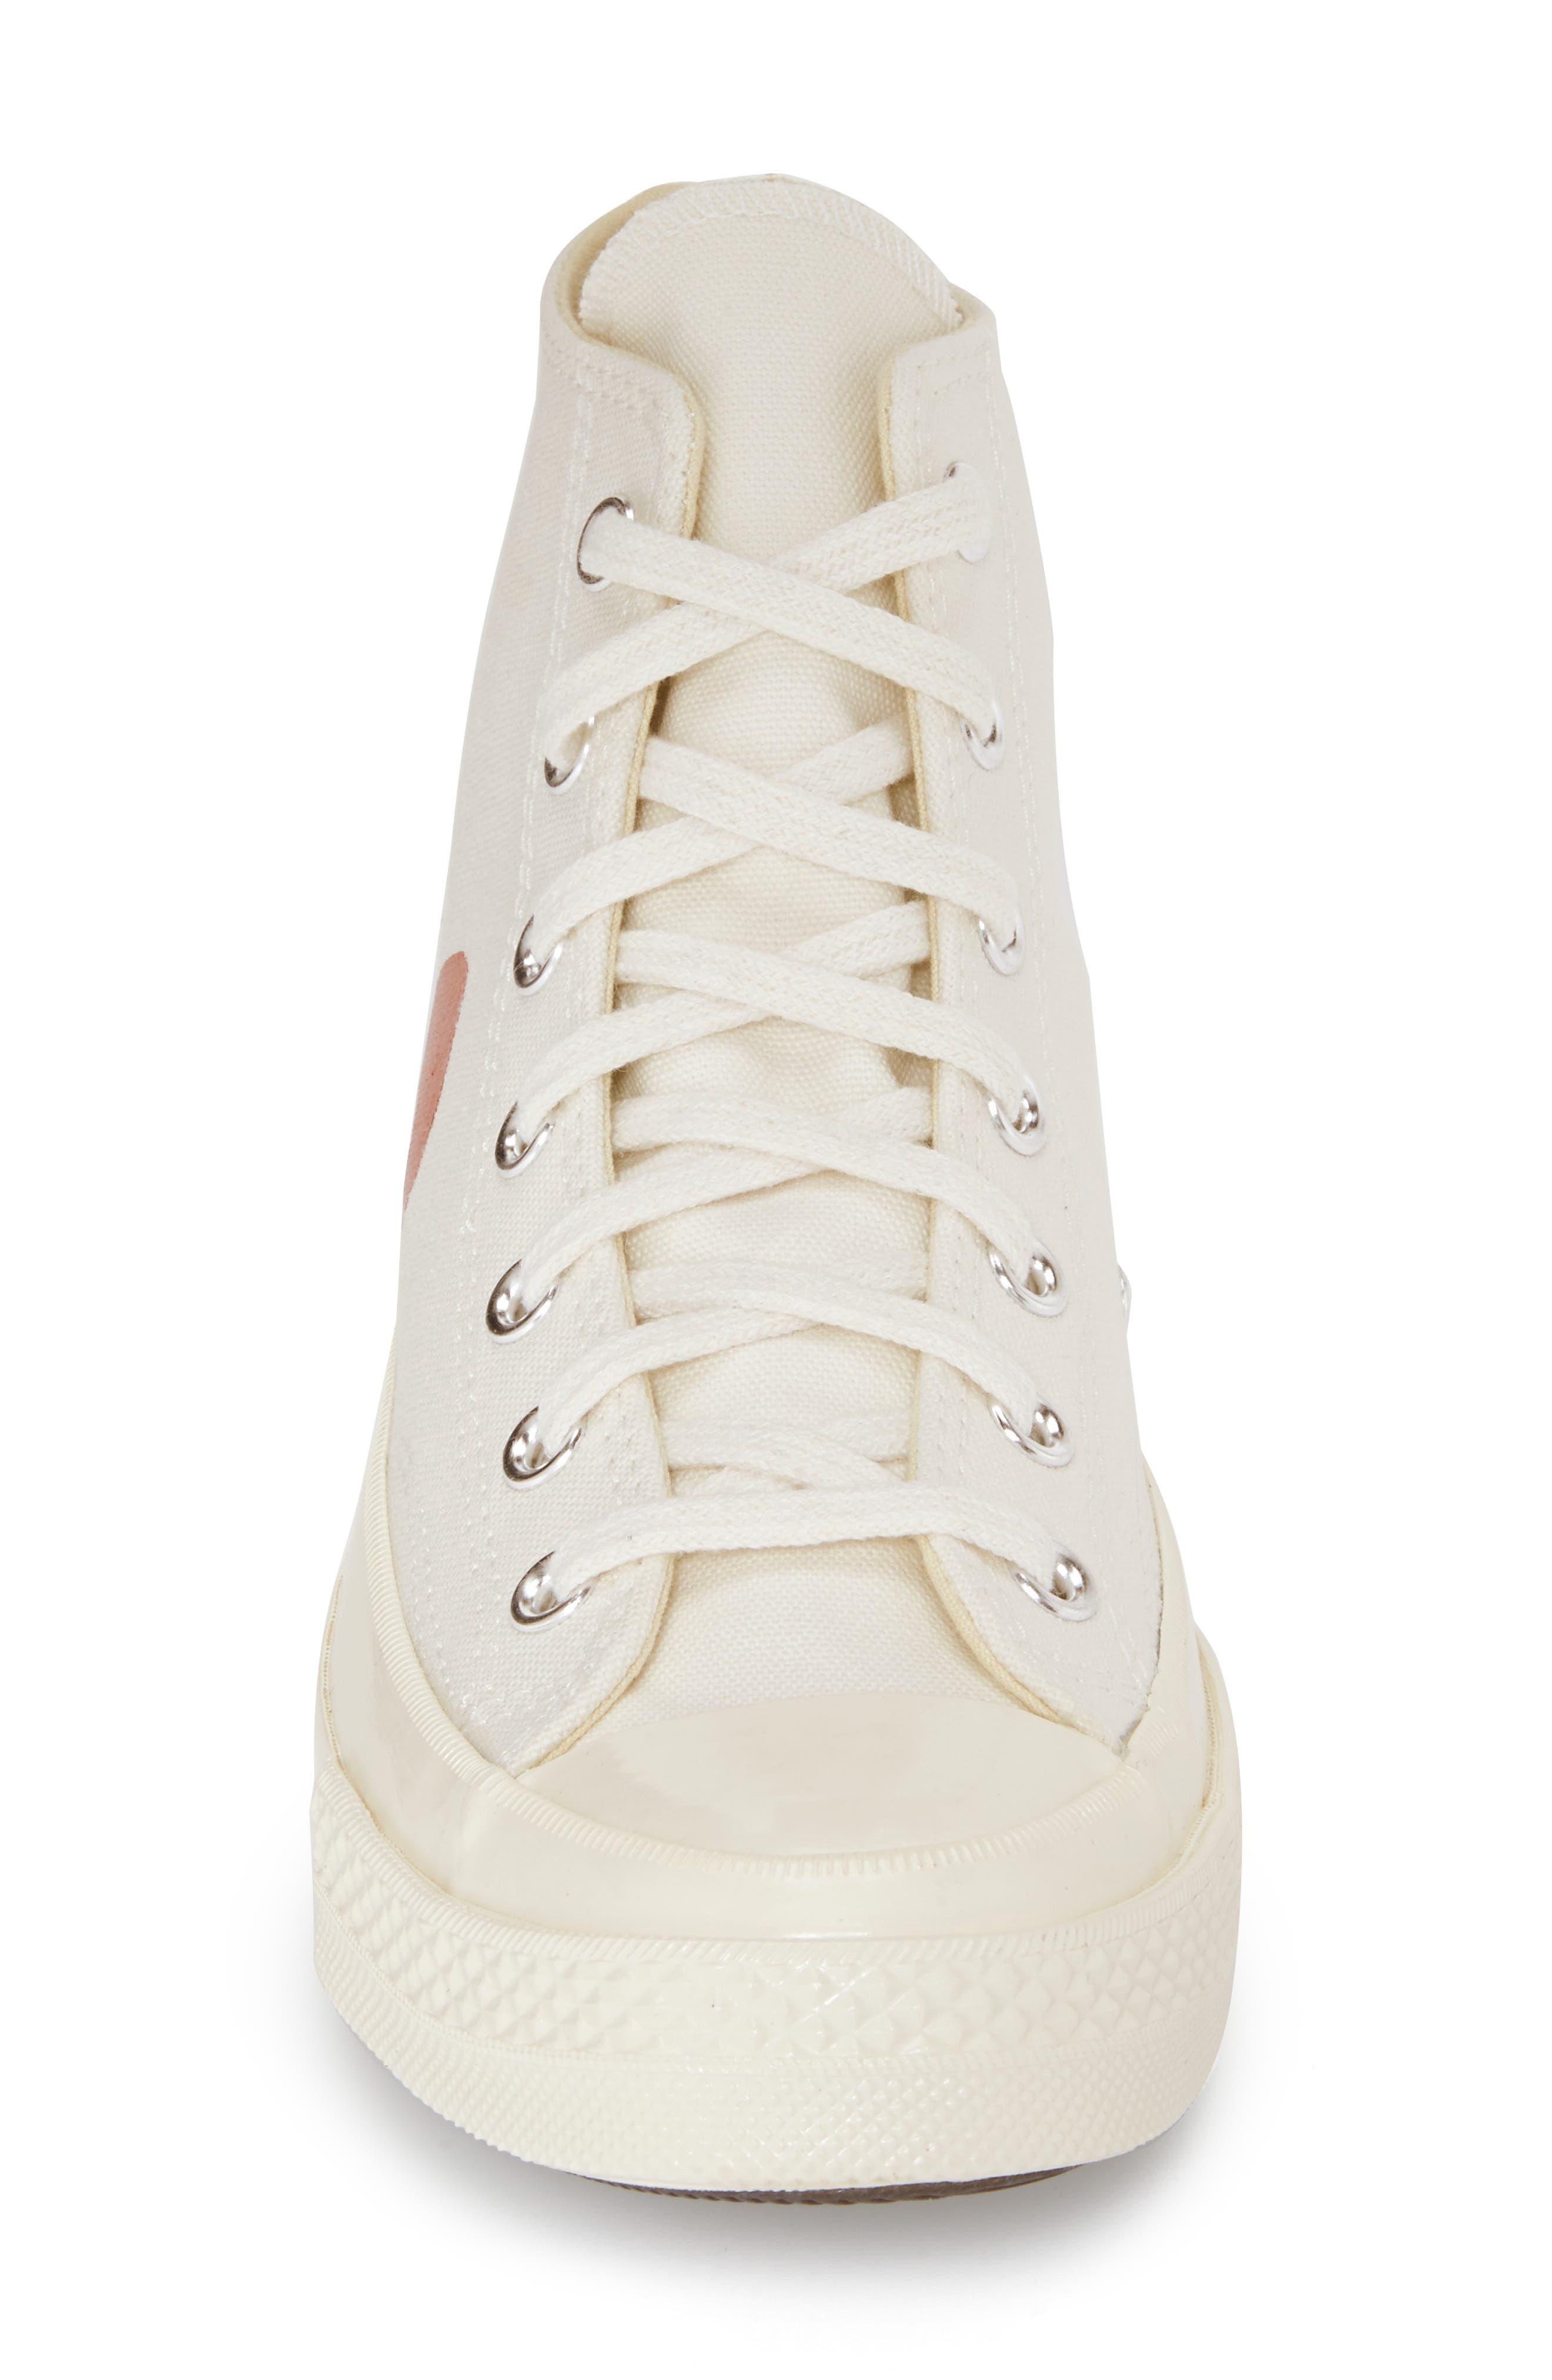 x Converse Chuck Taylor<sup>®</sup> Hidden Heart High Top Sneaker,                             Alternate thumbnail 3, color,                             BEIGE